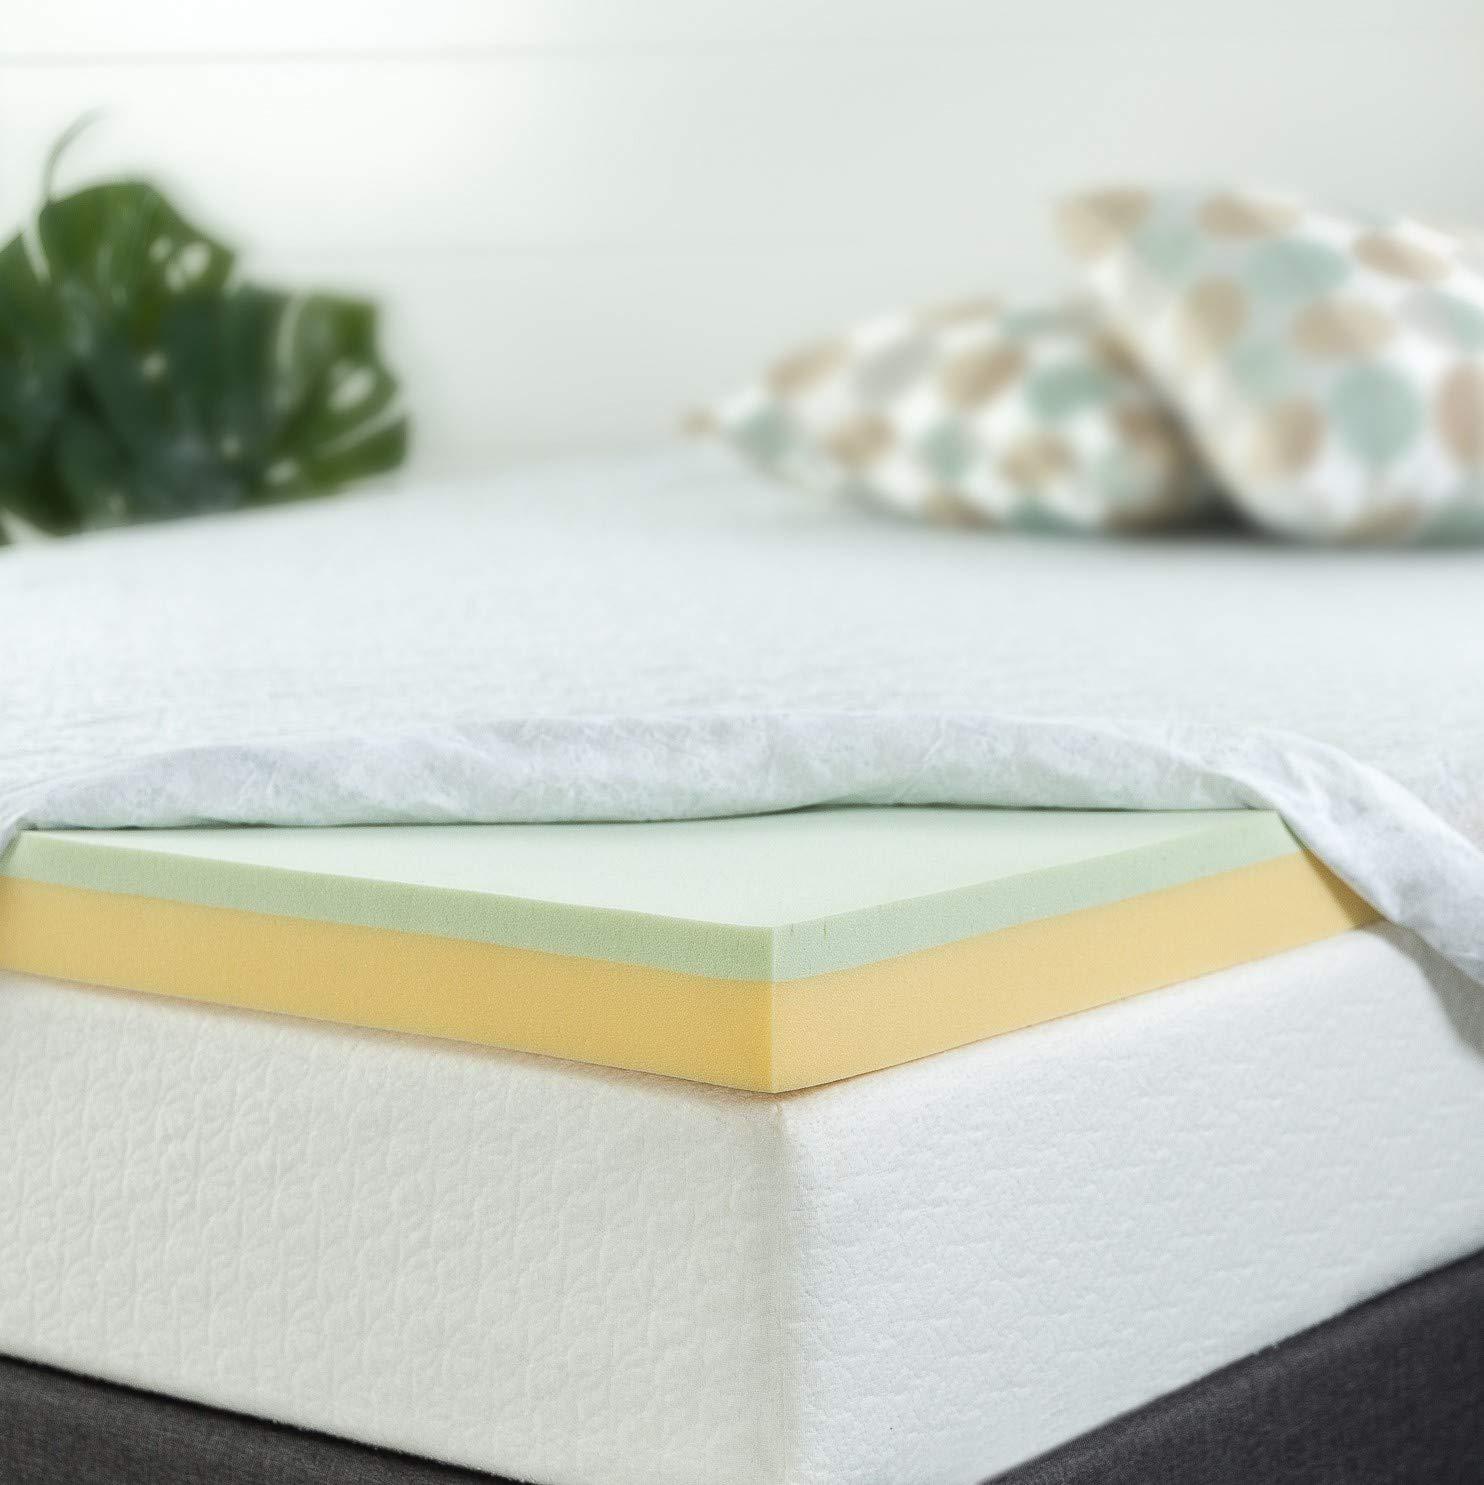 Zinus 4 Inch Green Tea Memory Foam Mattress Topper, Queen by Zinus